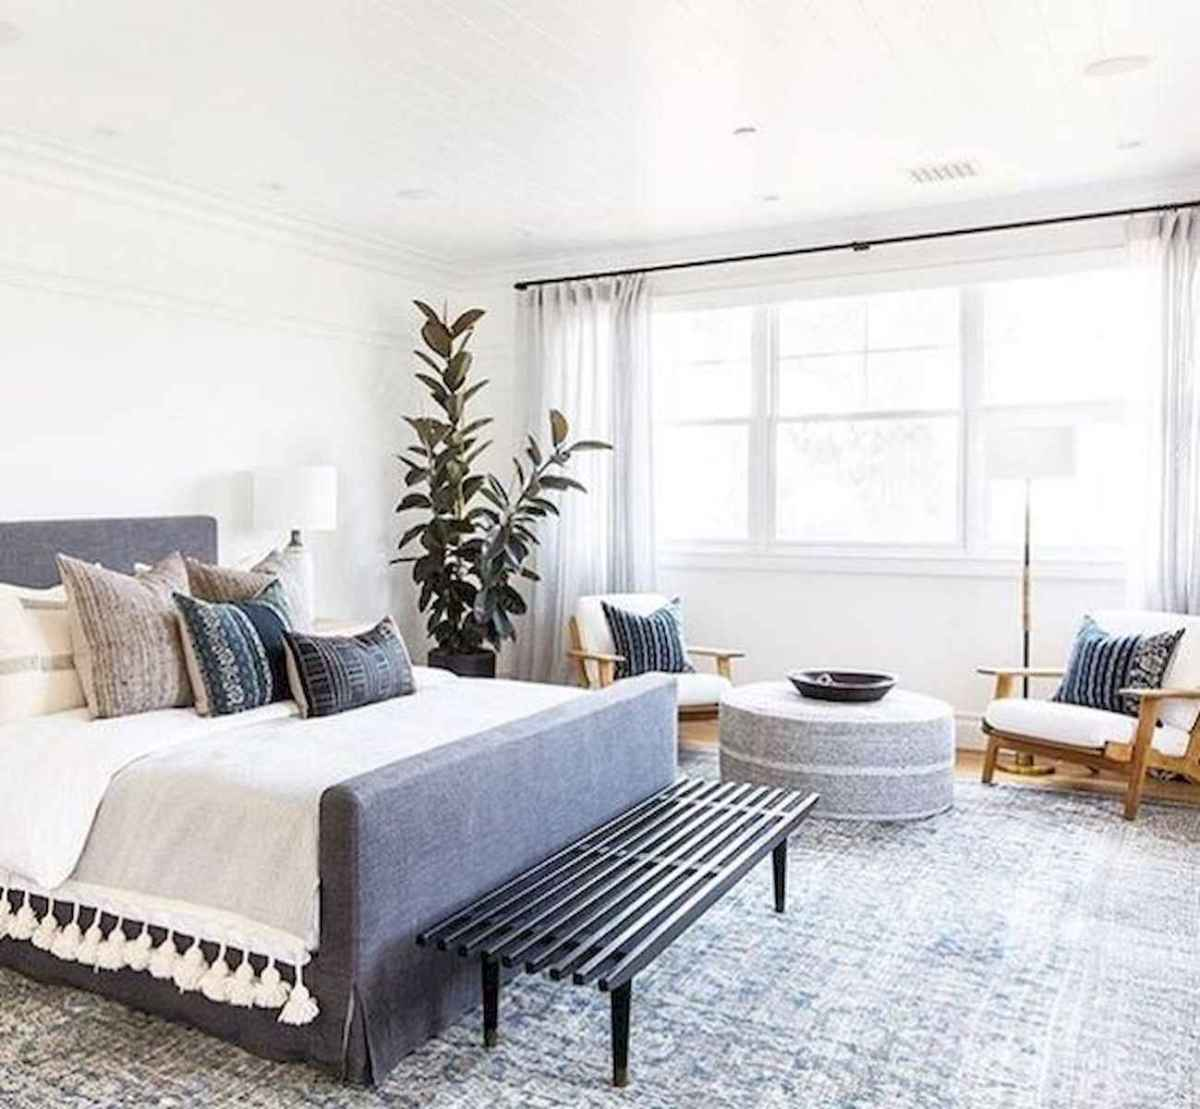 120 Awesome Farmhouse Master Bedroom Decor Ideas (21)